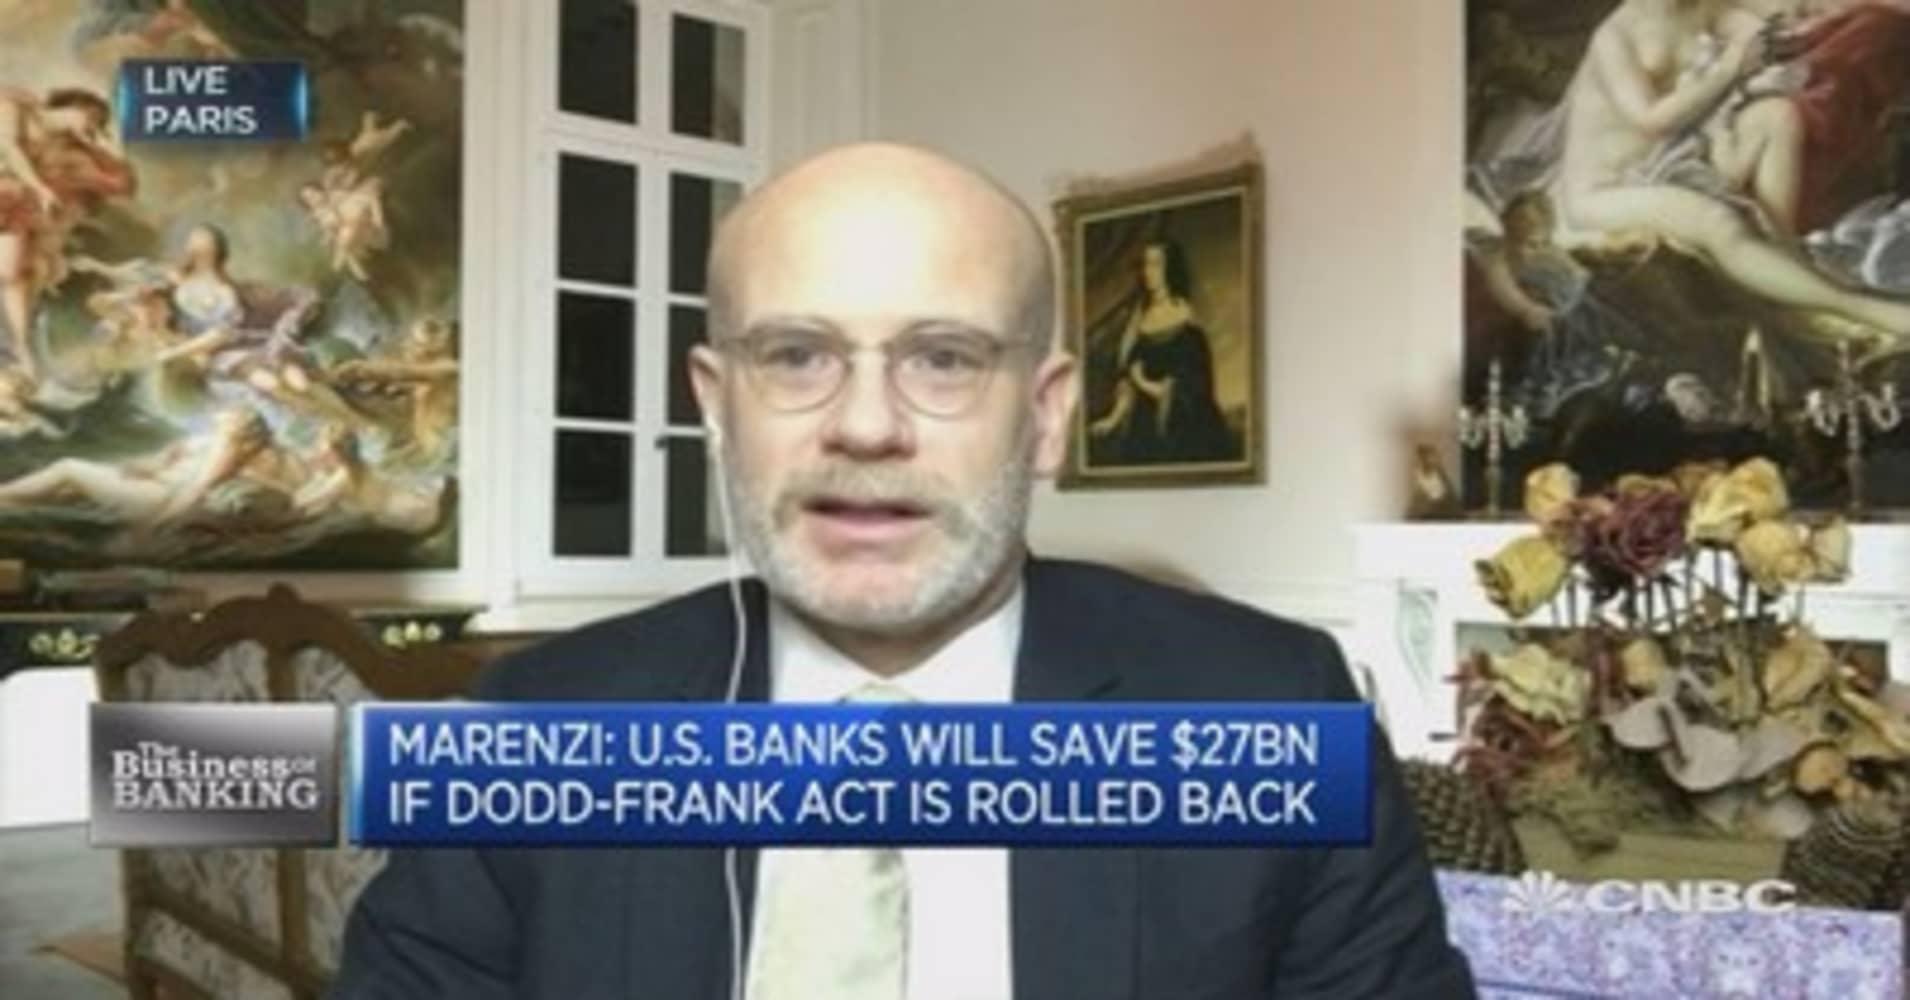 Deregulation will free up billions in revenues: Expert